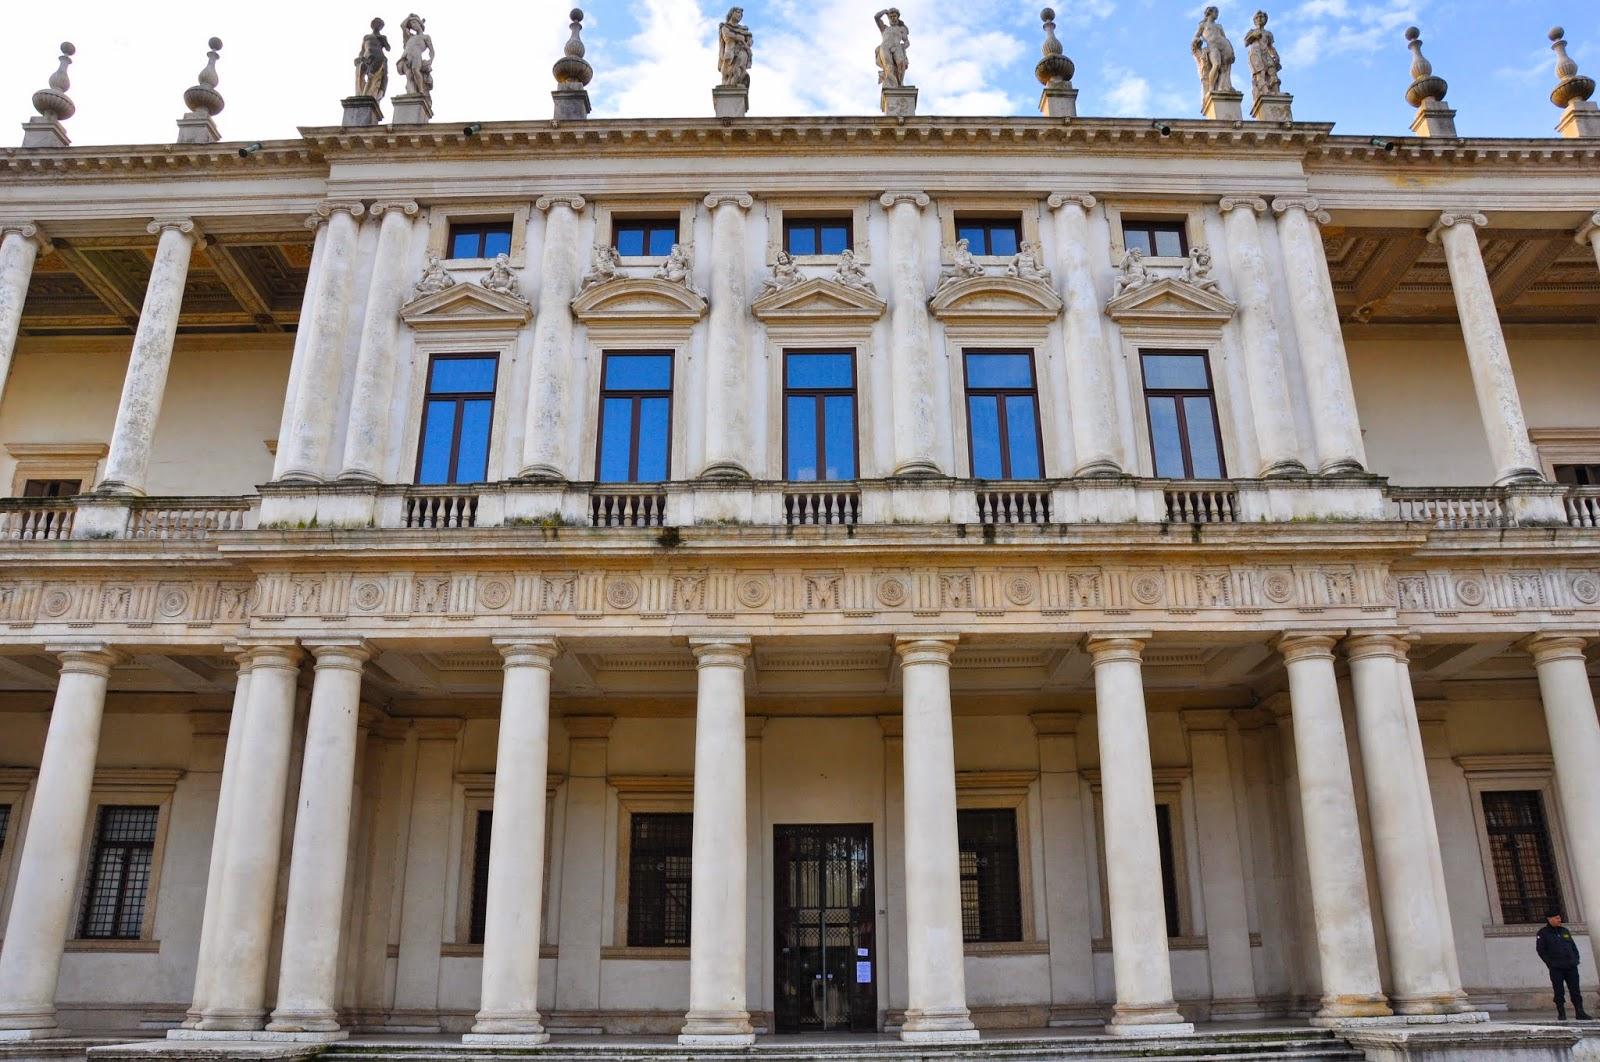 majestic facade Palazzo Chiericati Renaissance gem designed by Andrea Palladio Vicenza Italy